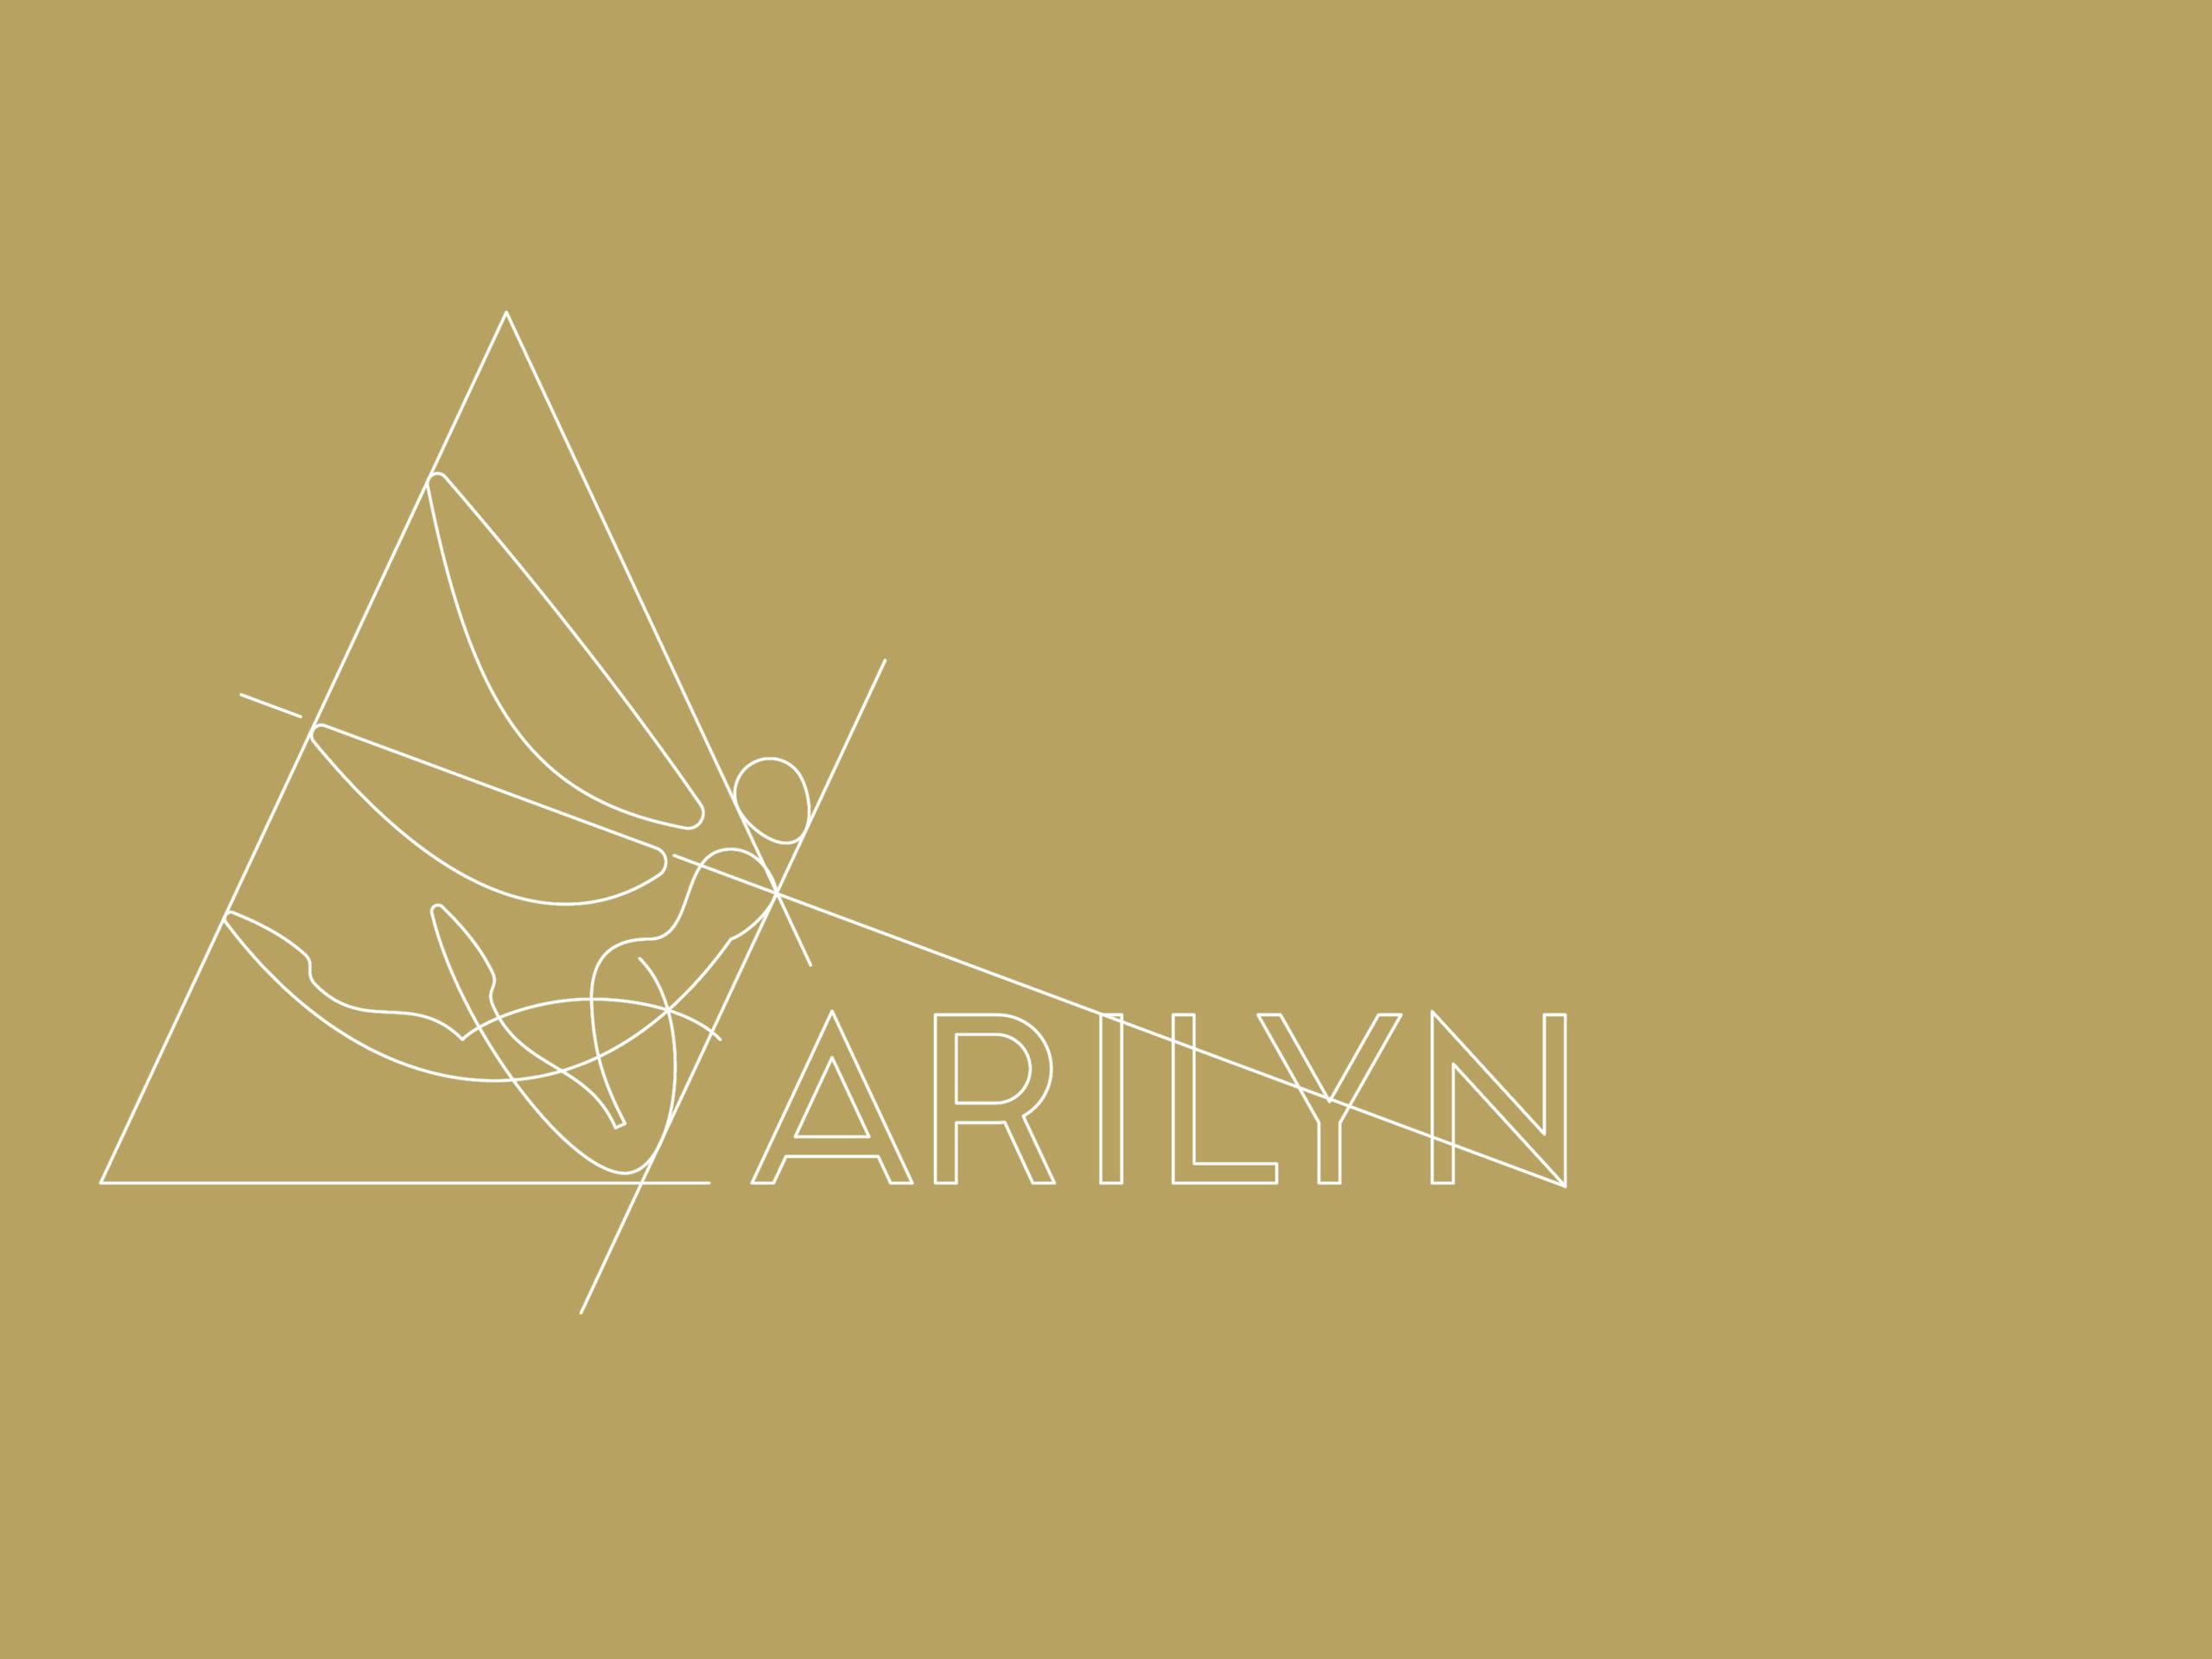 arilyn-tunnus1-goldprint-2019-11-22